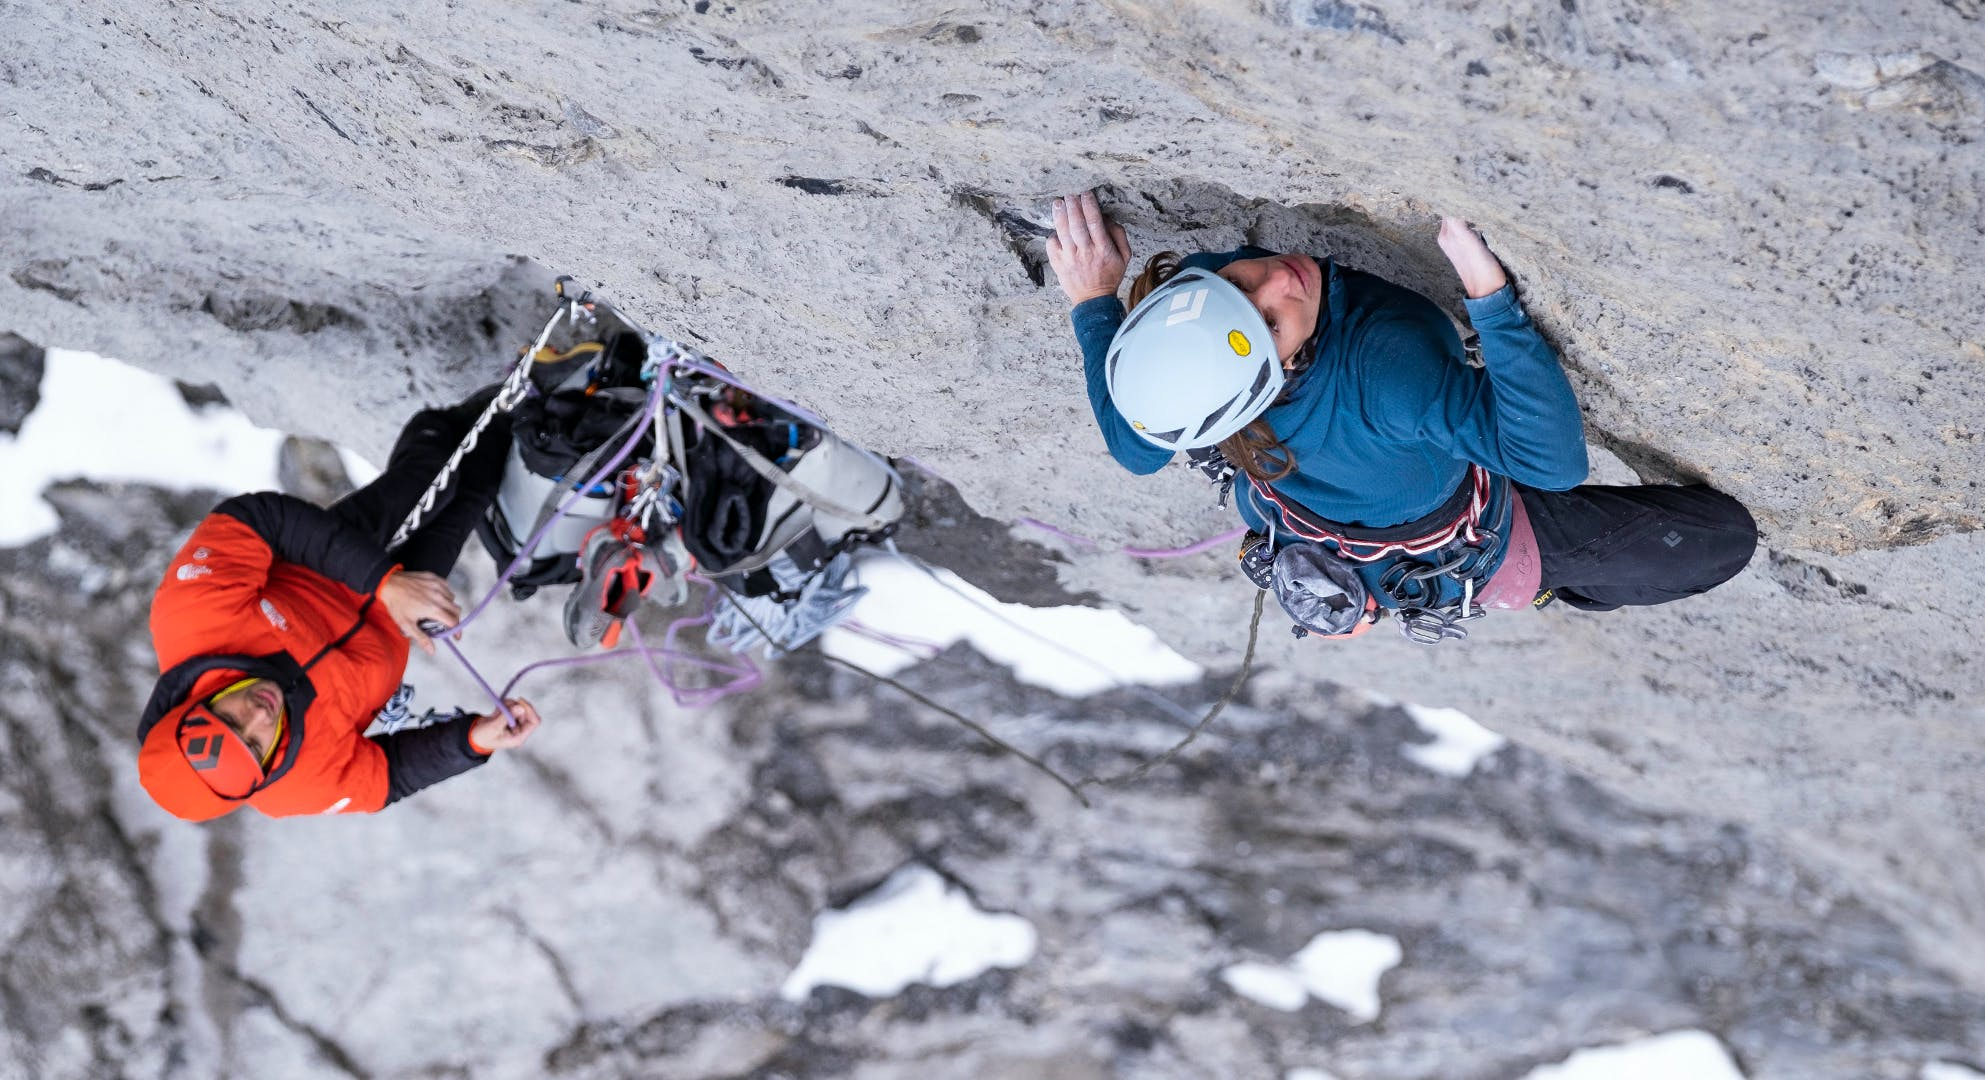 Black Diamond athletes Babsi Zangerl and Jacopo Larcher climbing the Eiger